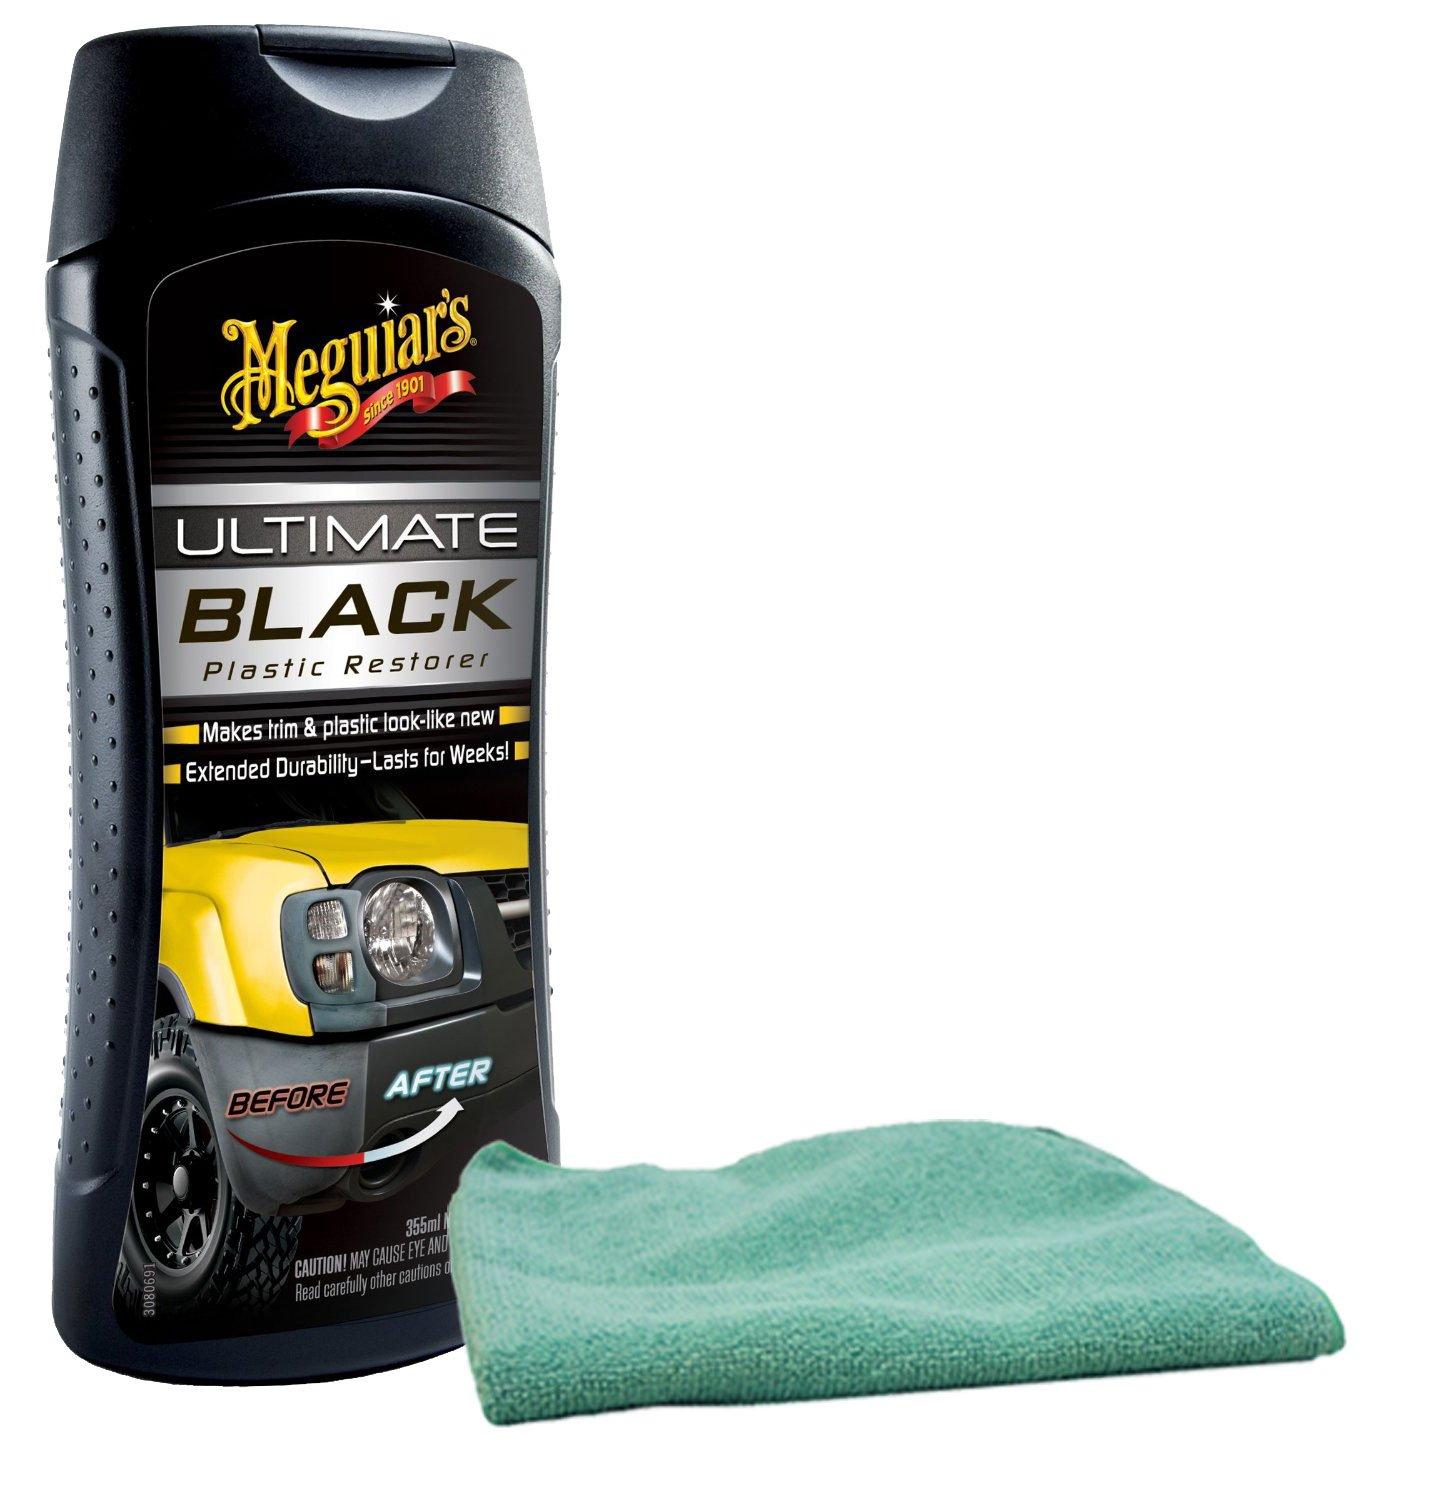 Meguiars Ultimate Black Plastic Restorer (12 oz) Bundle With Microfiber Cloth (2 Items)